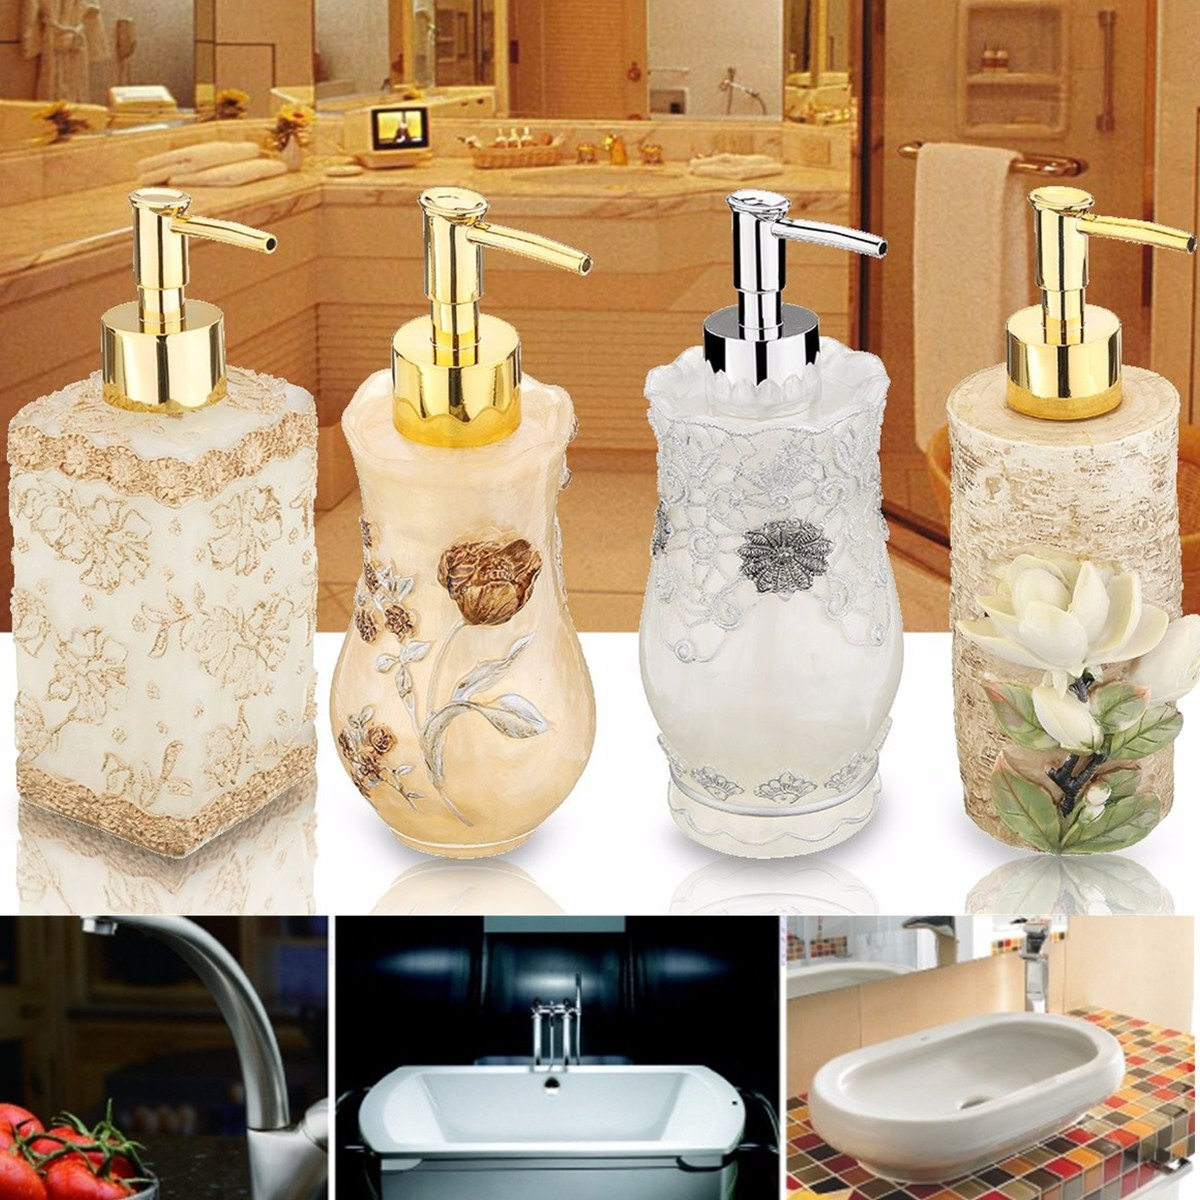 Modern 300ML Resin Bath Bathroom Soap Pump Dispenser Hand Bottle Lotion Liquid Shampoo Essential Oils Lotion Shampoo Gel Container Sink Hand Sanitizer